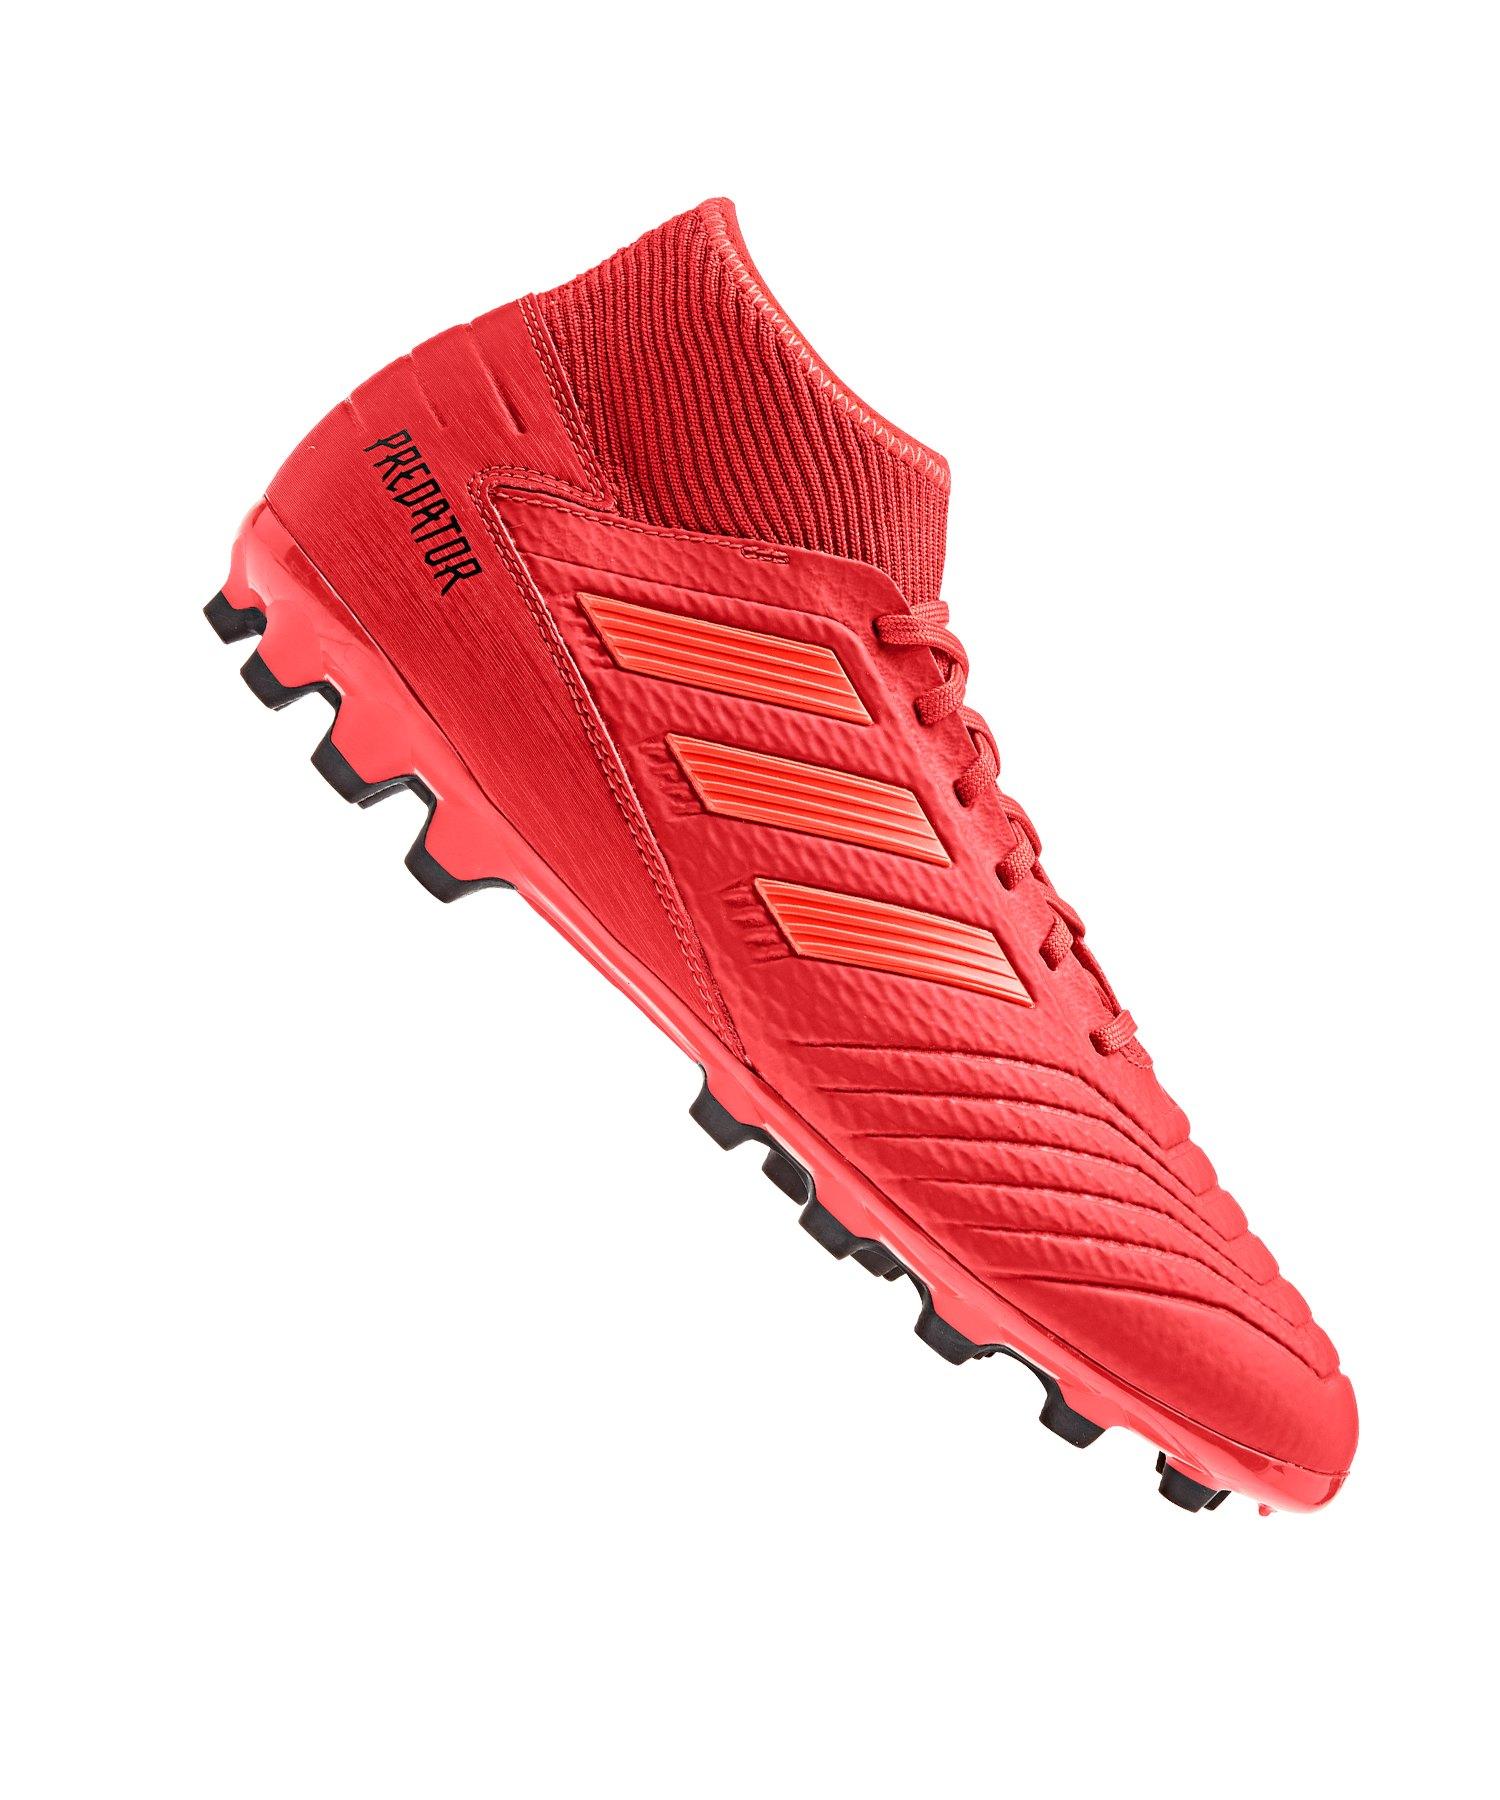 adidas Predator 19.3 AG Rot Schwarz